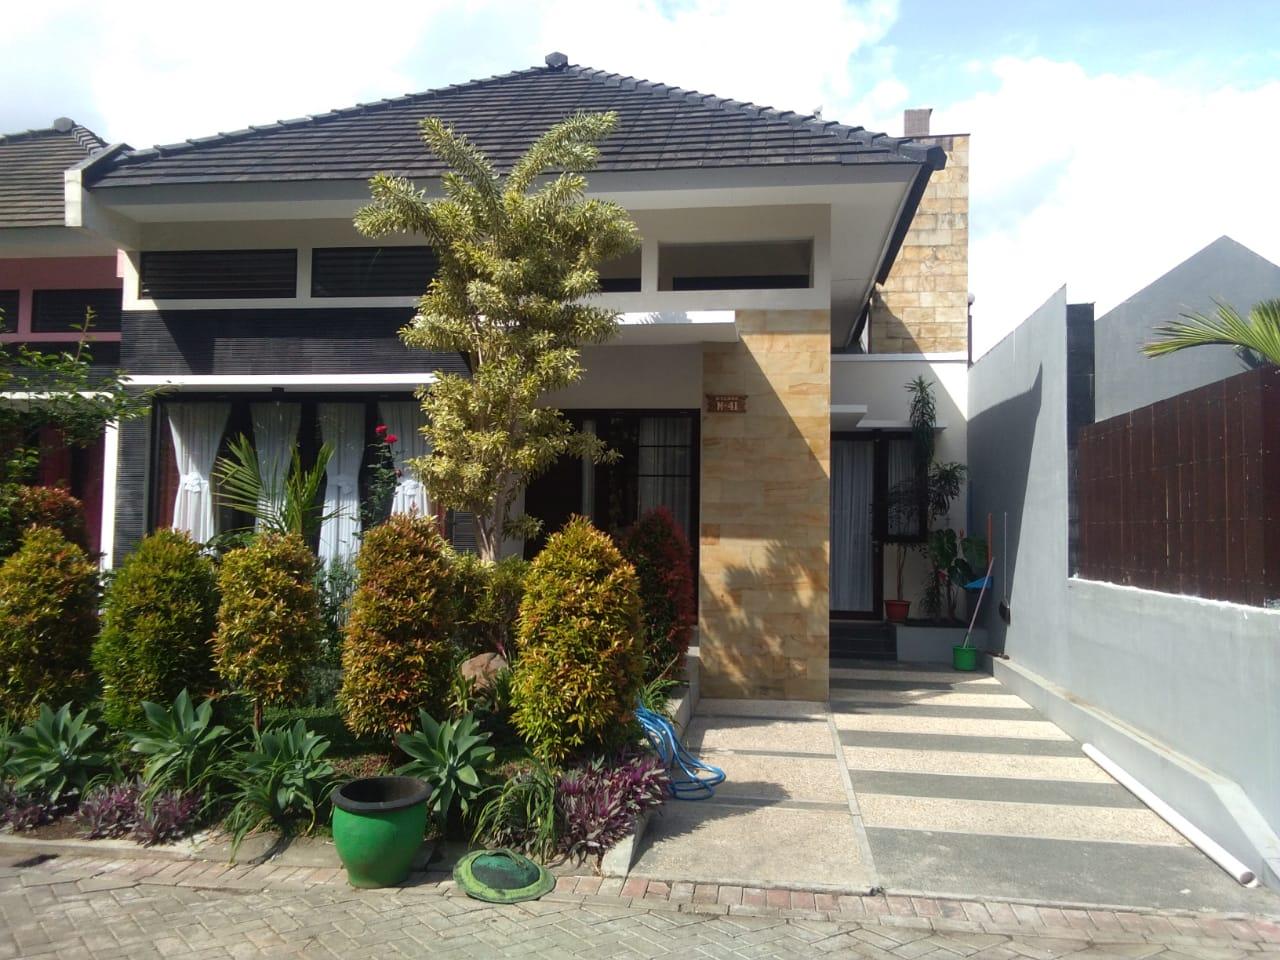 batureservasi.com - Villa Pinus M41 Kota Wisata Batu Malang